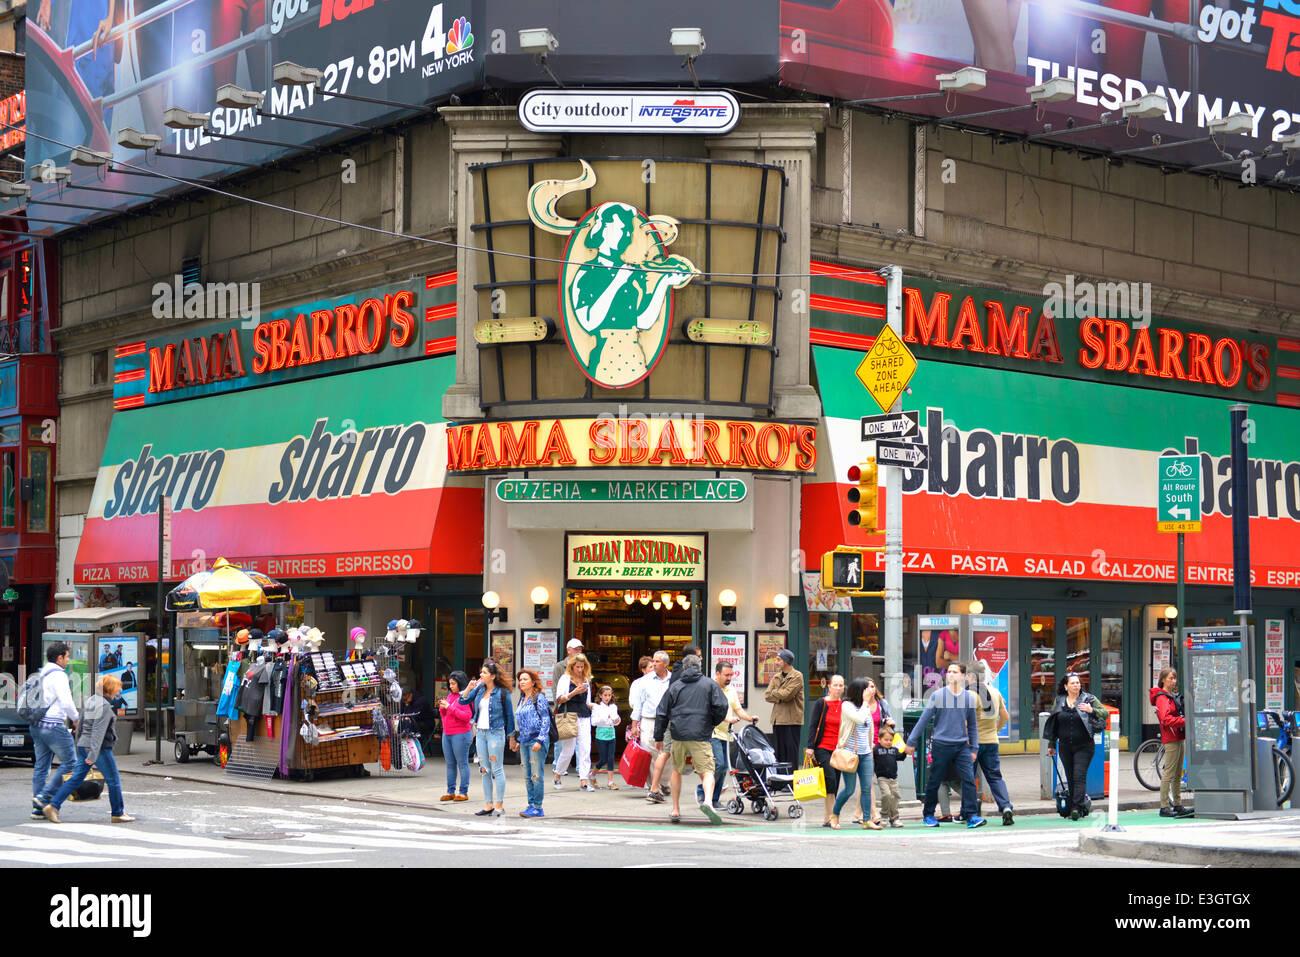 Sbarro, Mama Sbarro's, Times Square, New York - Stock Image